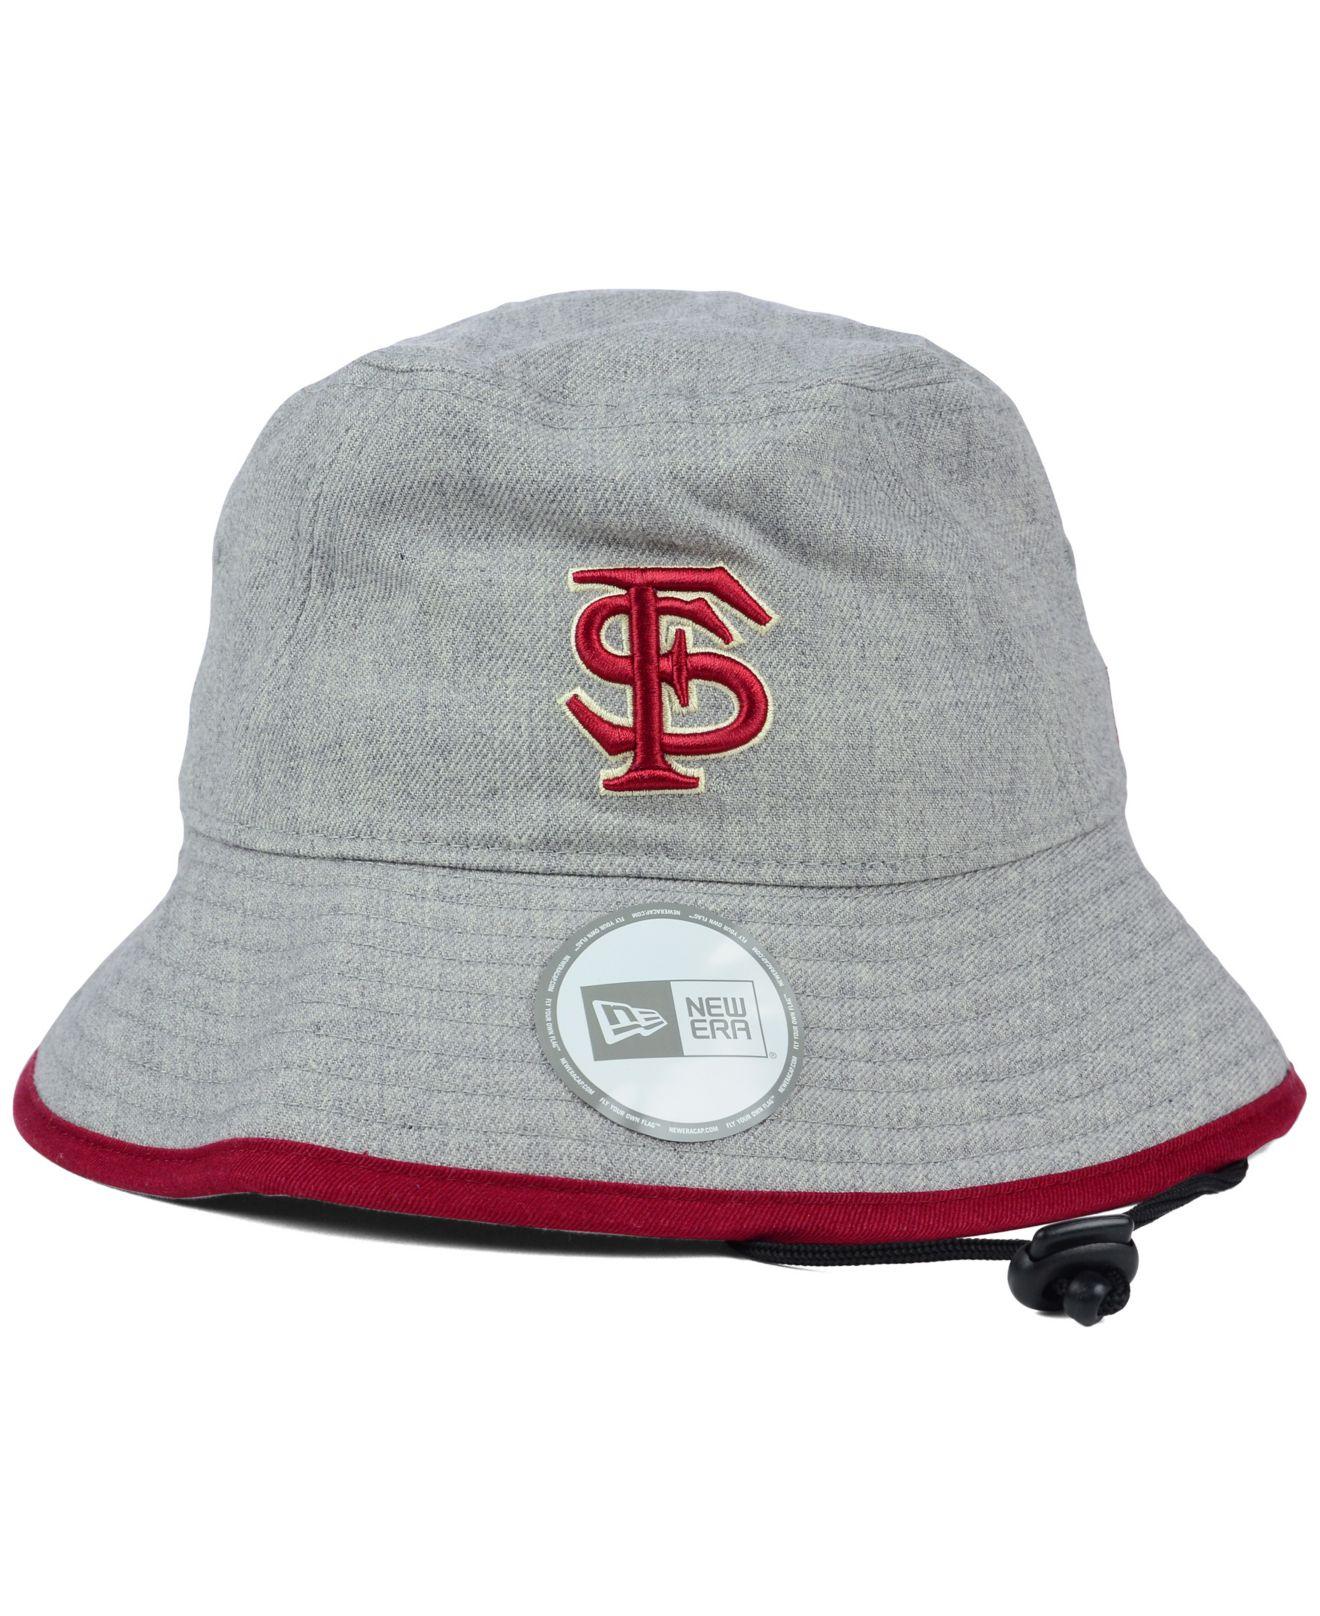 d5b9cd8064a3e KTZ Florida State Seminoles Tip Bucket Hat in Gray - Lyst